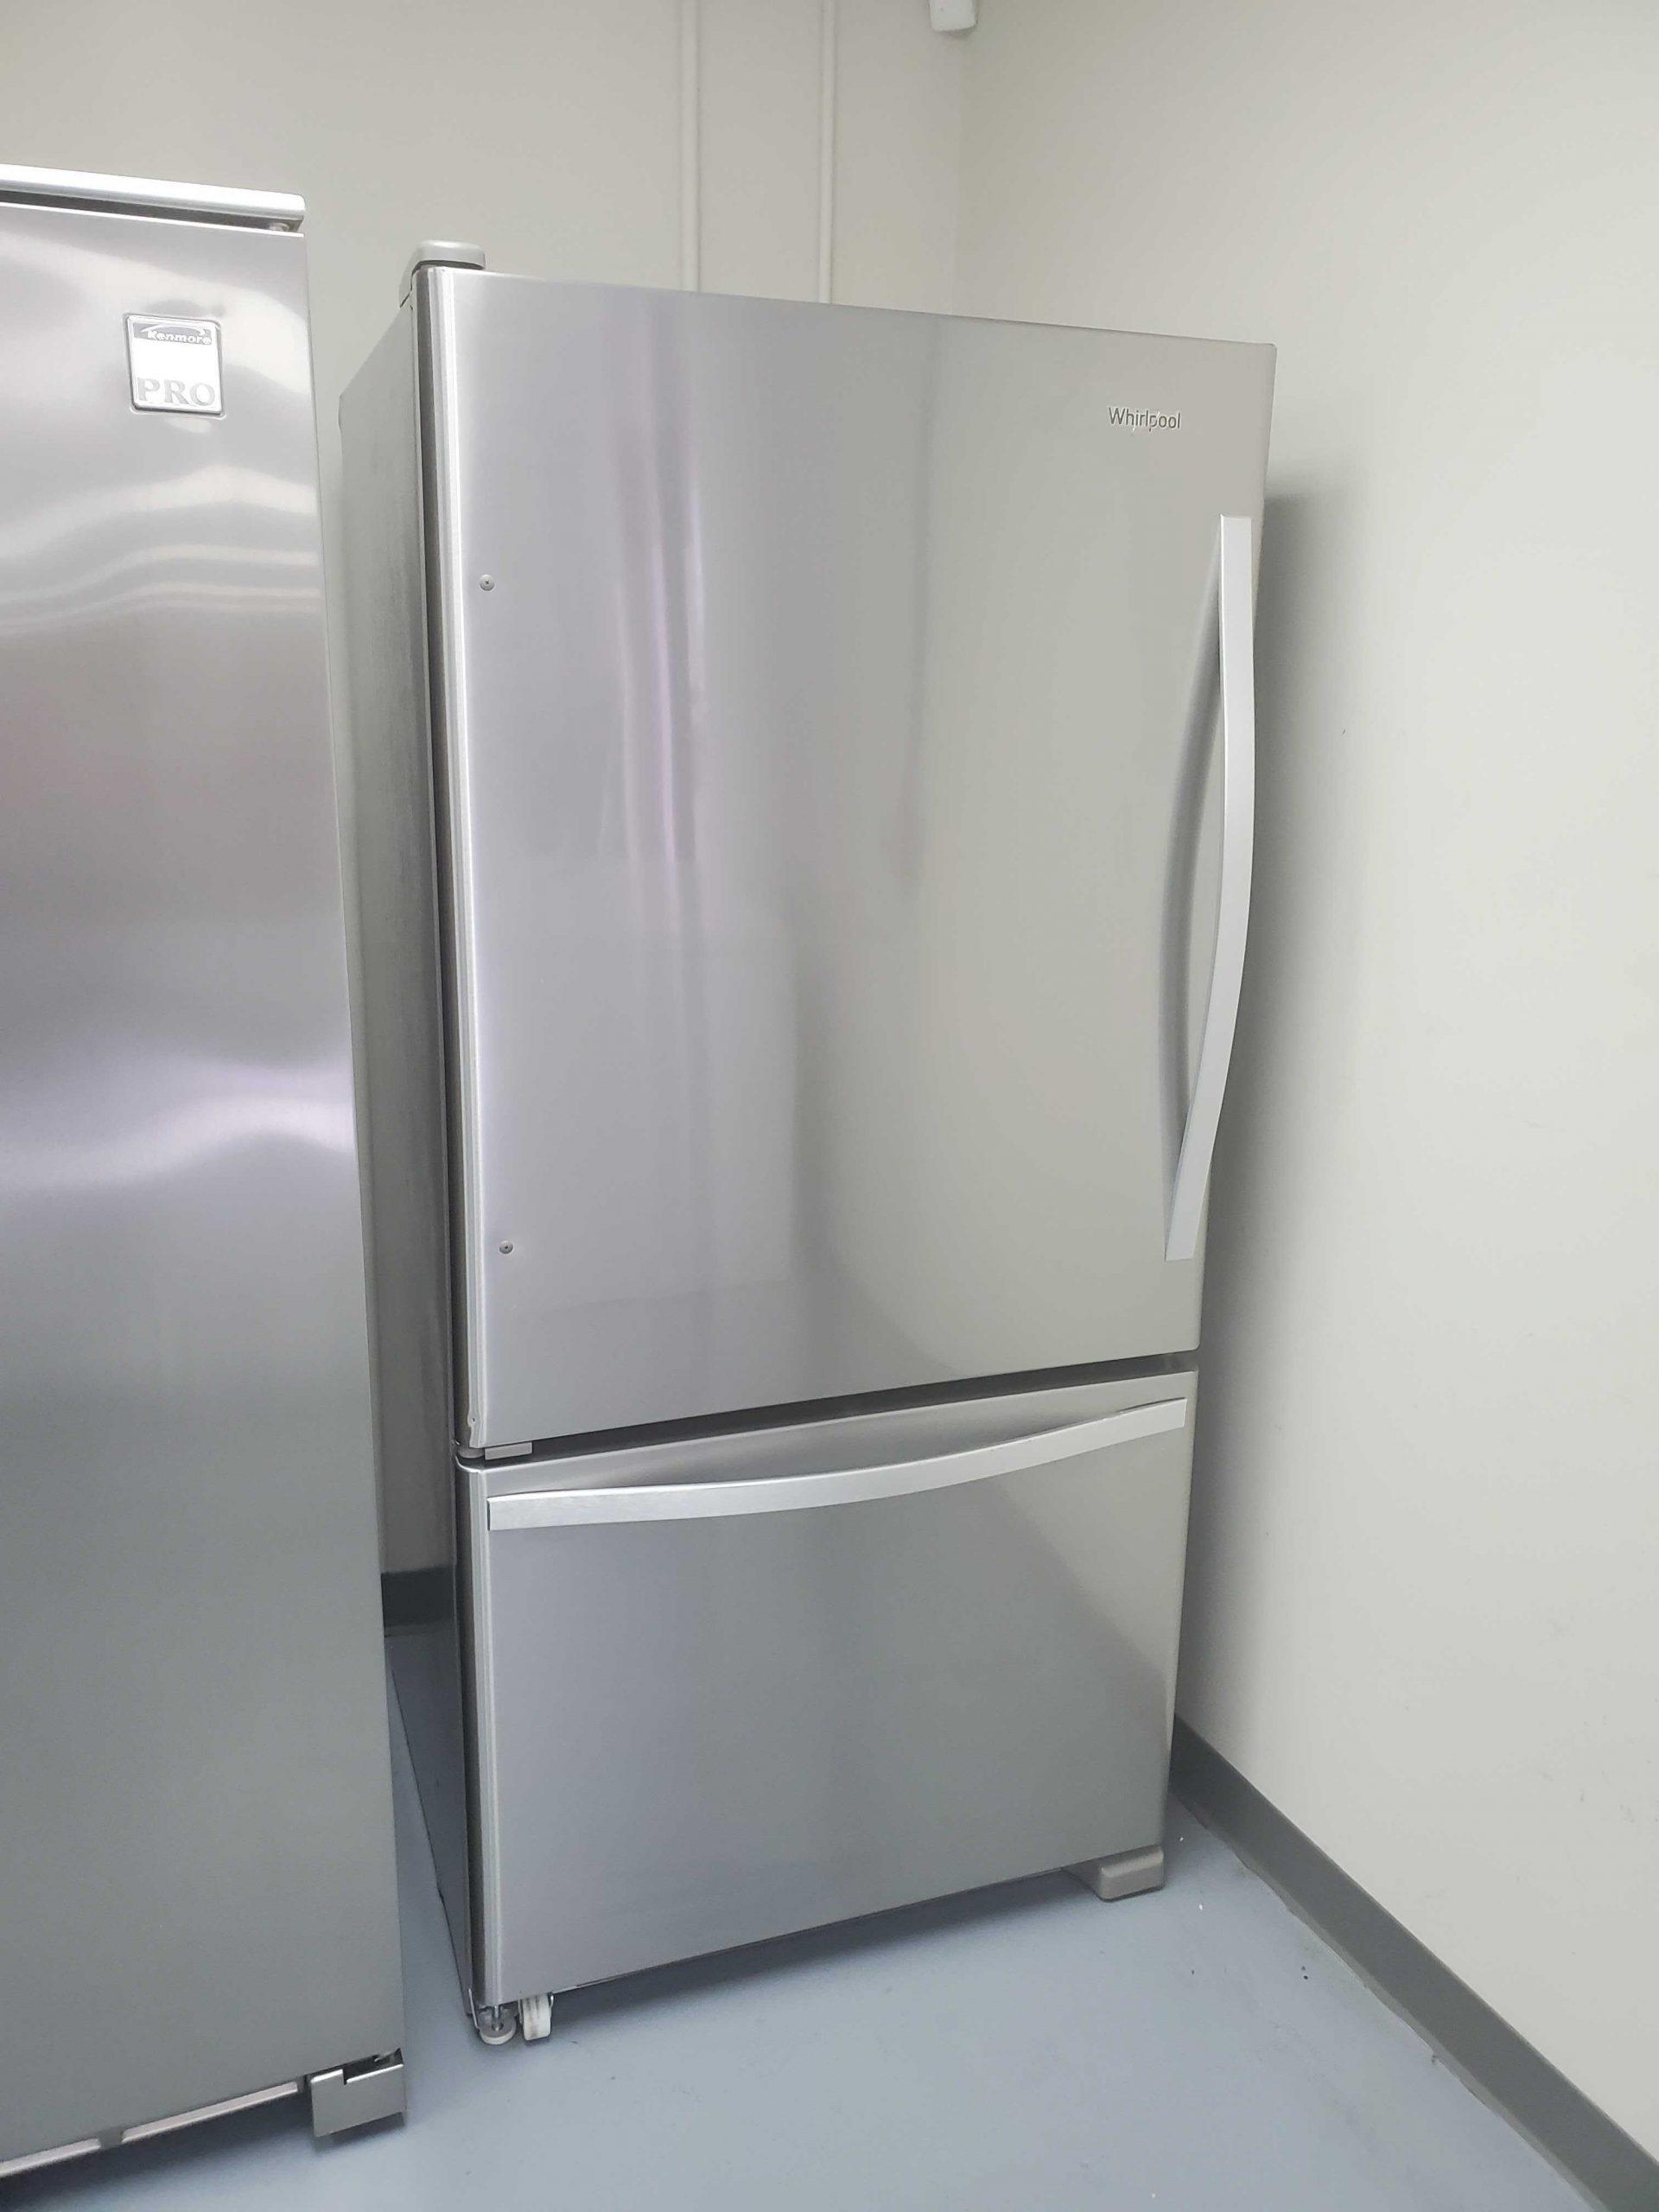 Whirlpool 22 07 Cu Ft Bottom Freezer Refrigerator With Ice Maker Stainless Steel Appliance Repair Company In Birmingham Al